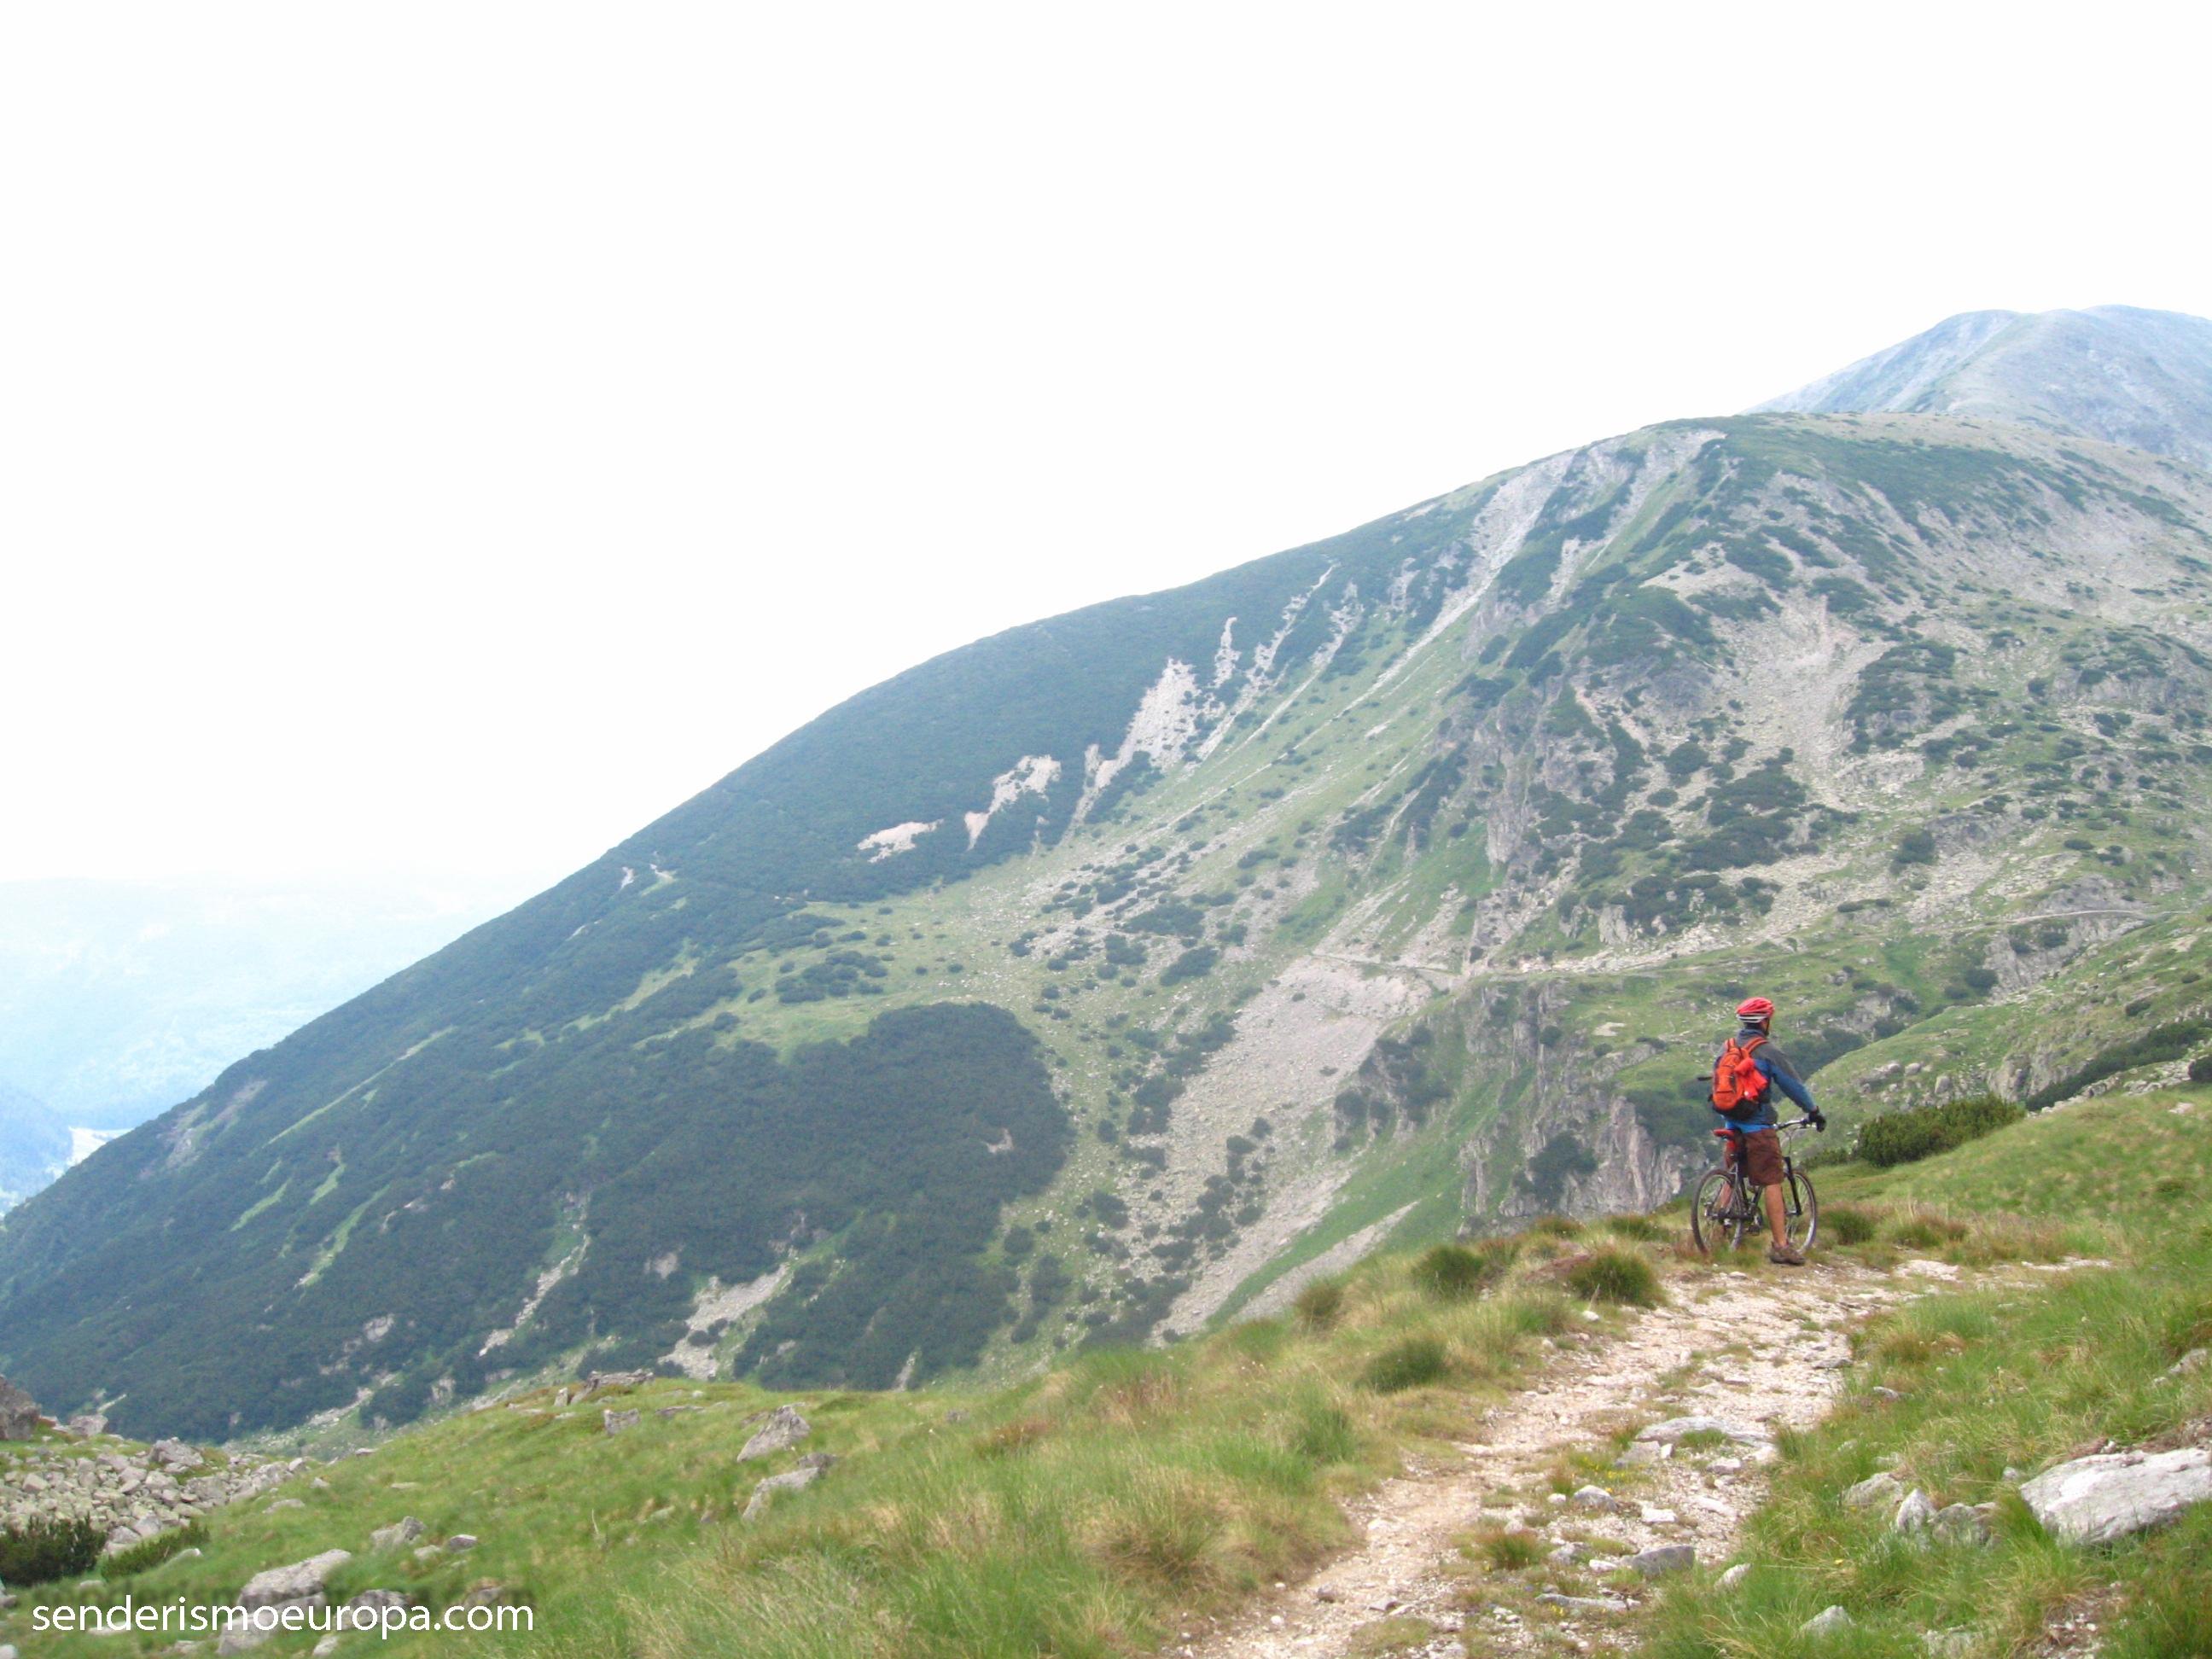 viaje en bicicleta organizado por bulgaria